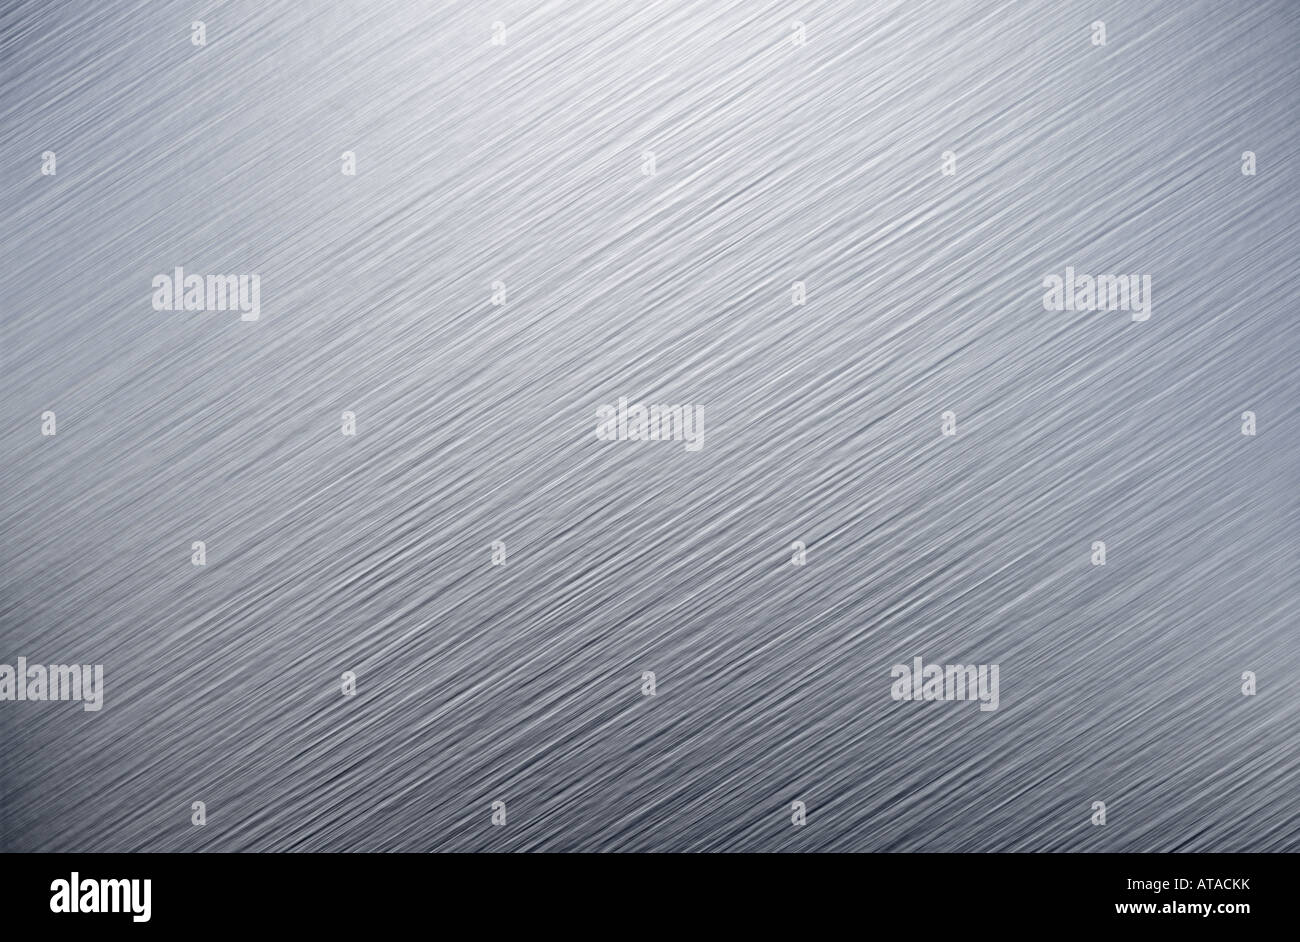 very large sheet of brushed steel metal - Stock Image